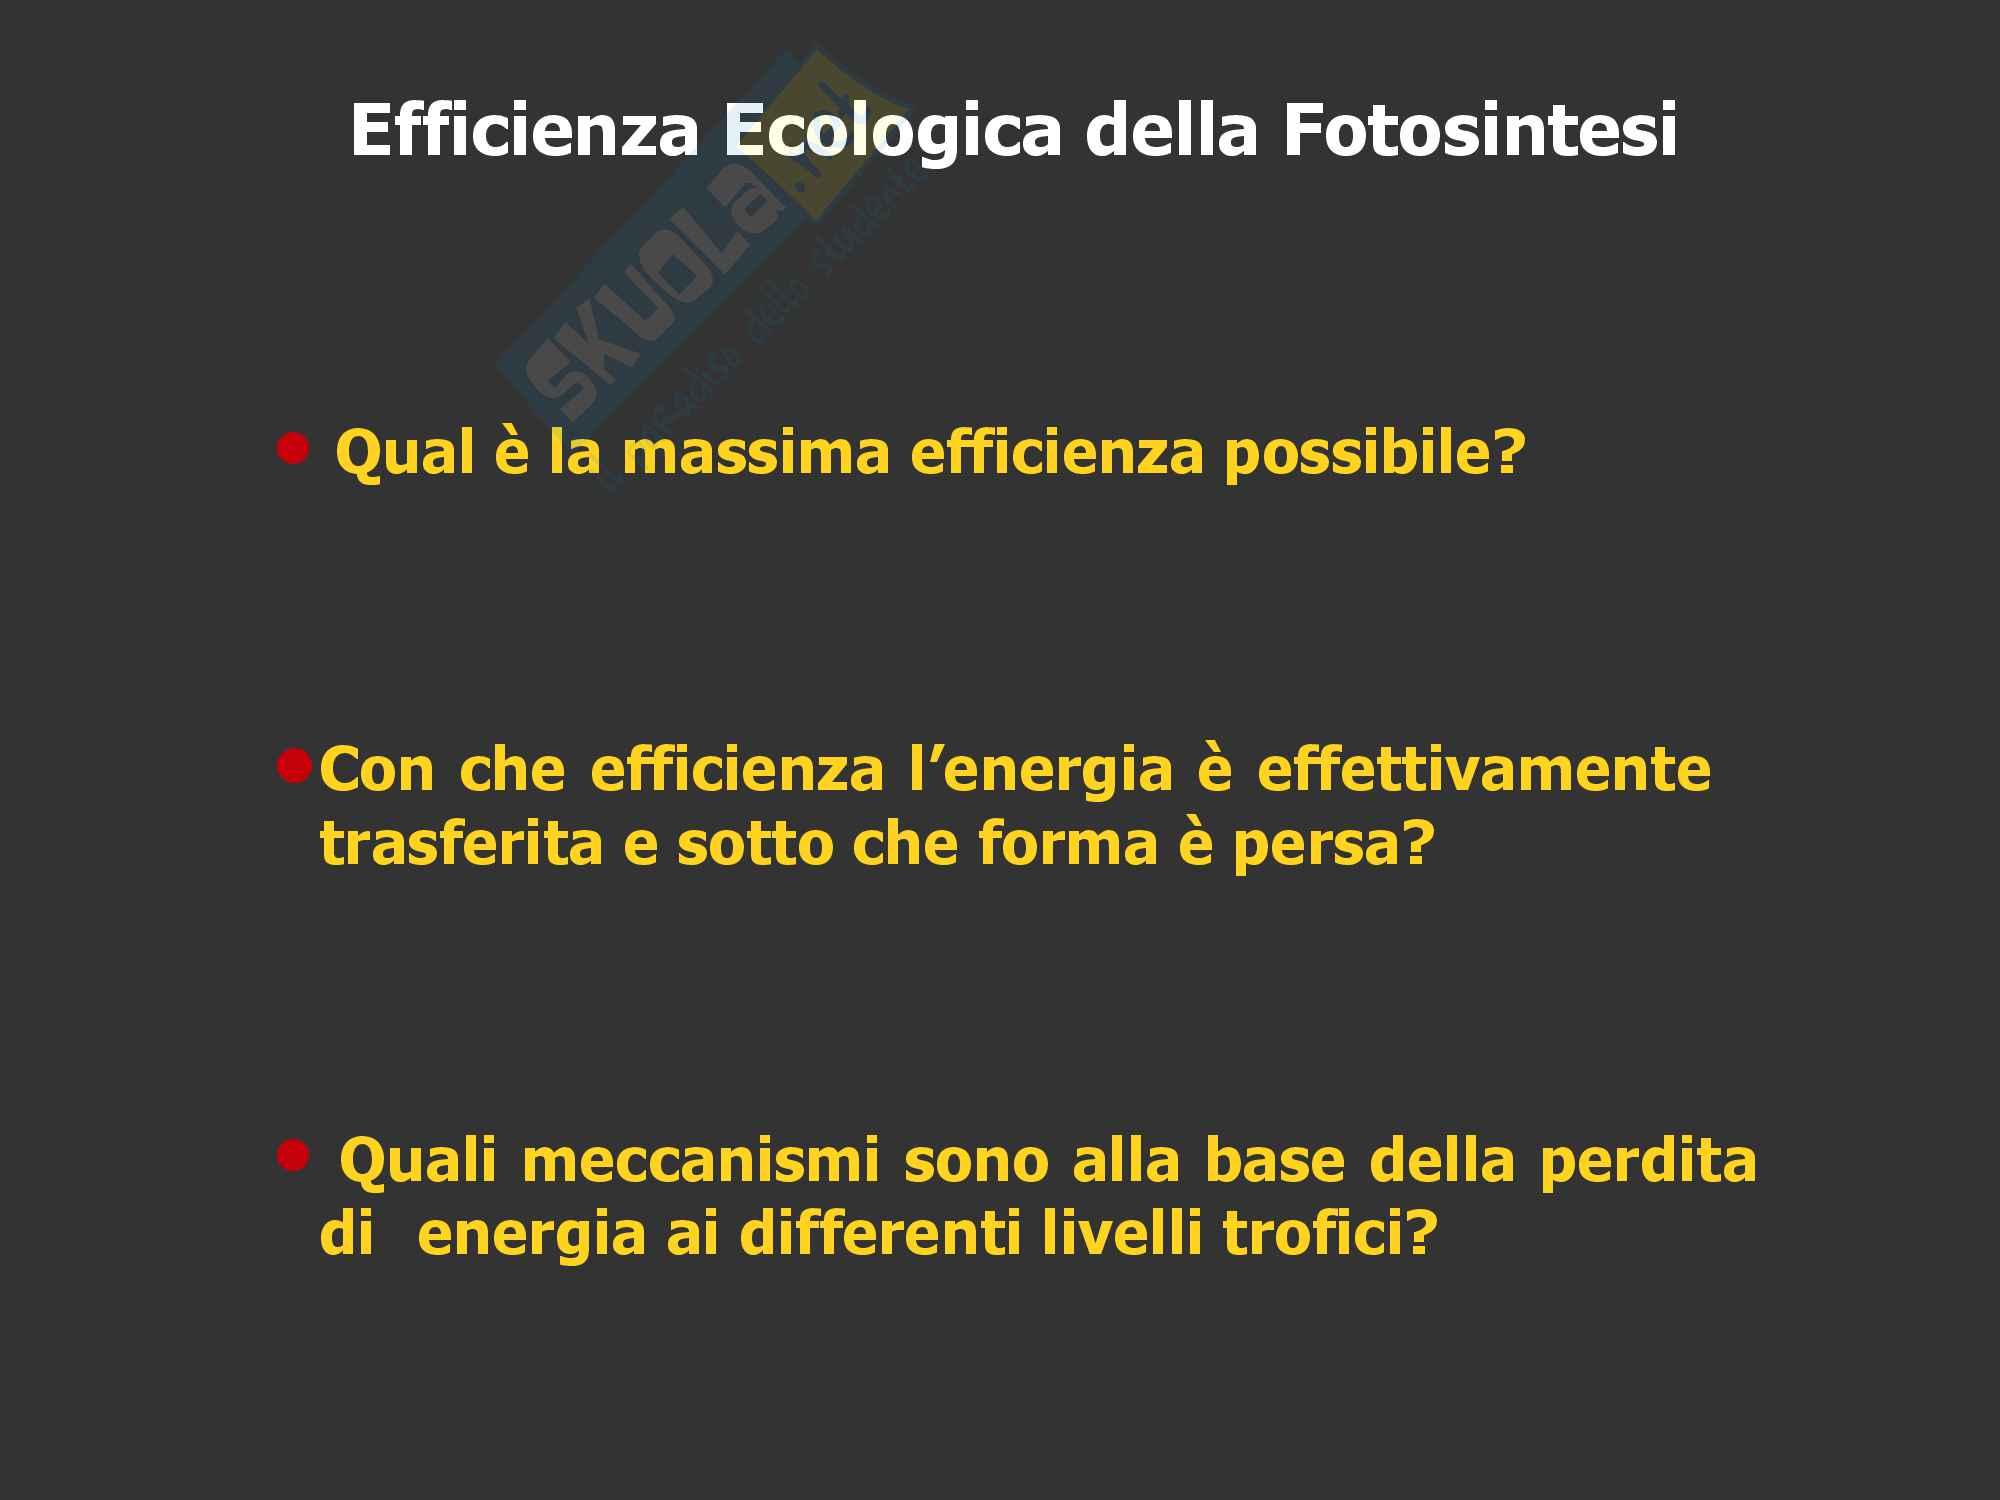 Ecologia: Efficienza ecologica della fotosintesi